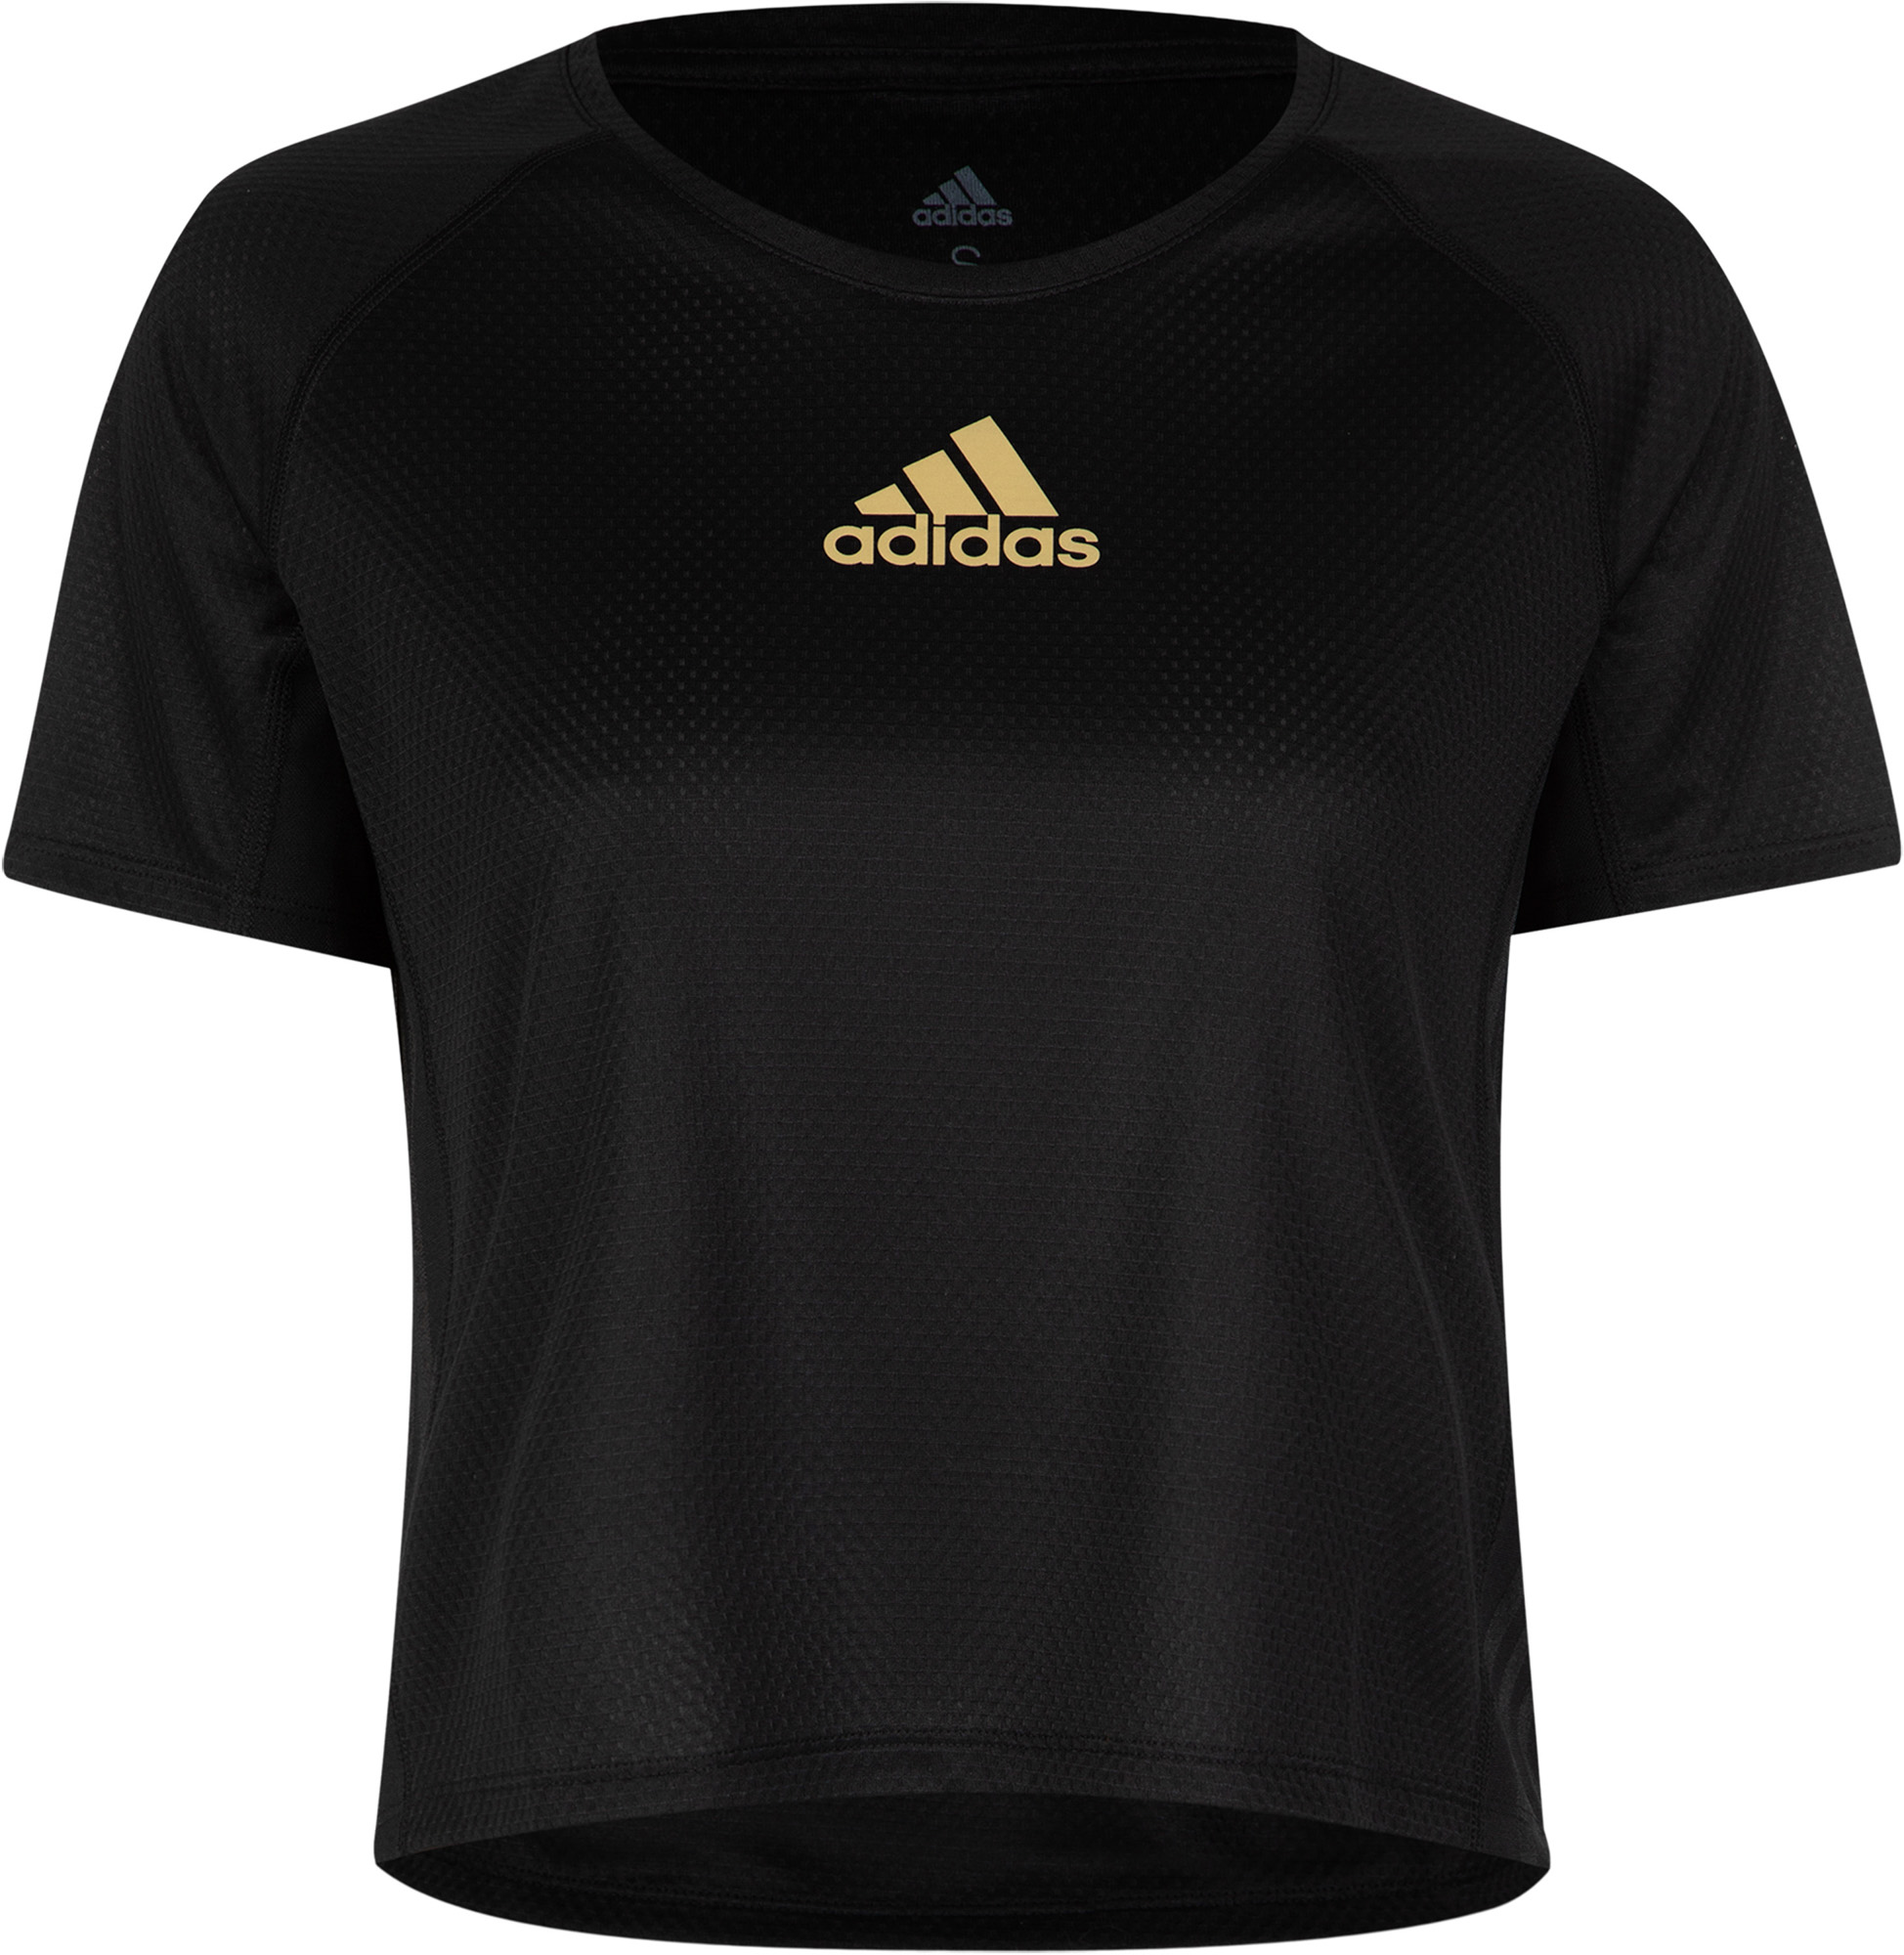 Adidas Футболка женская Adidas Unlimited, размер 50-52 adidas футболка freelift grad linkha